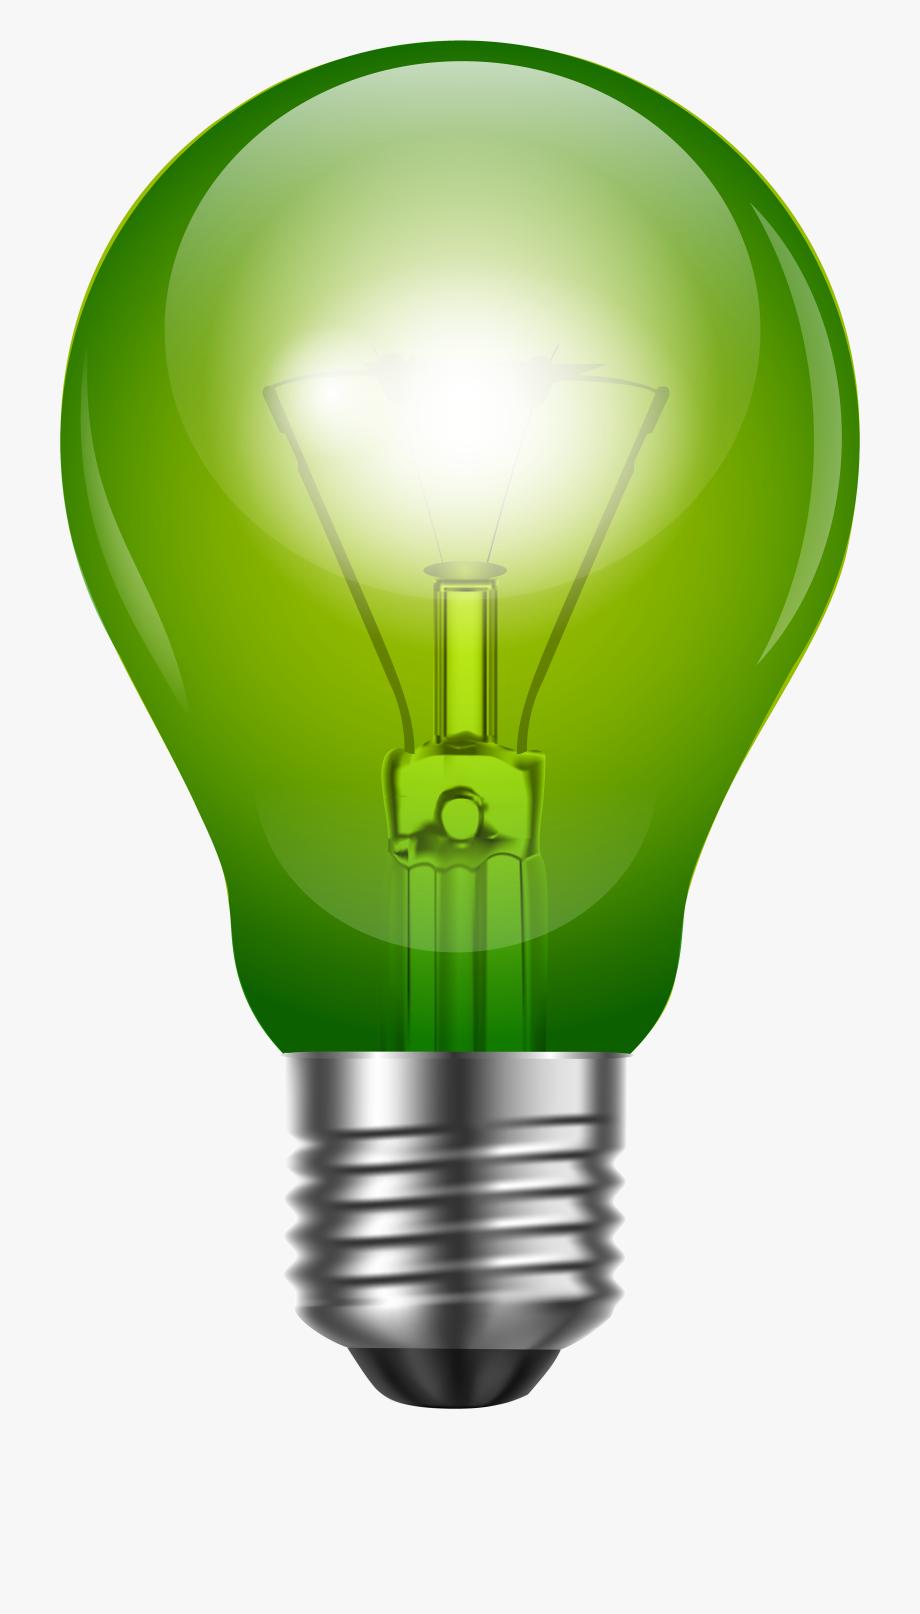 Electricity clipart lighting. Light bulb green clip